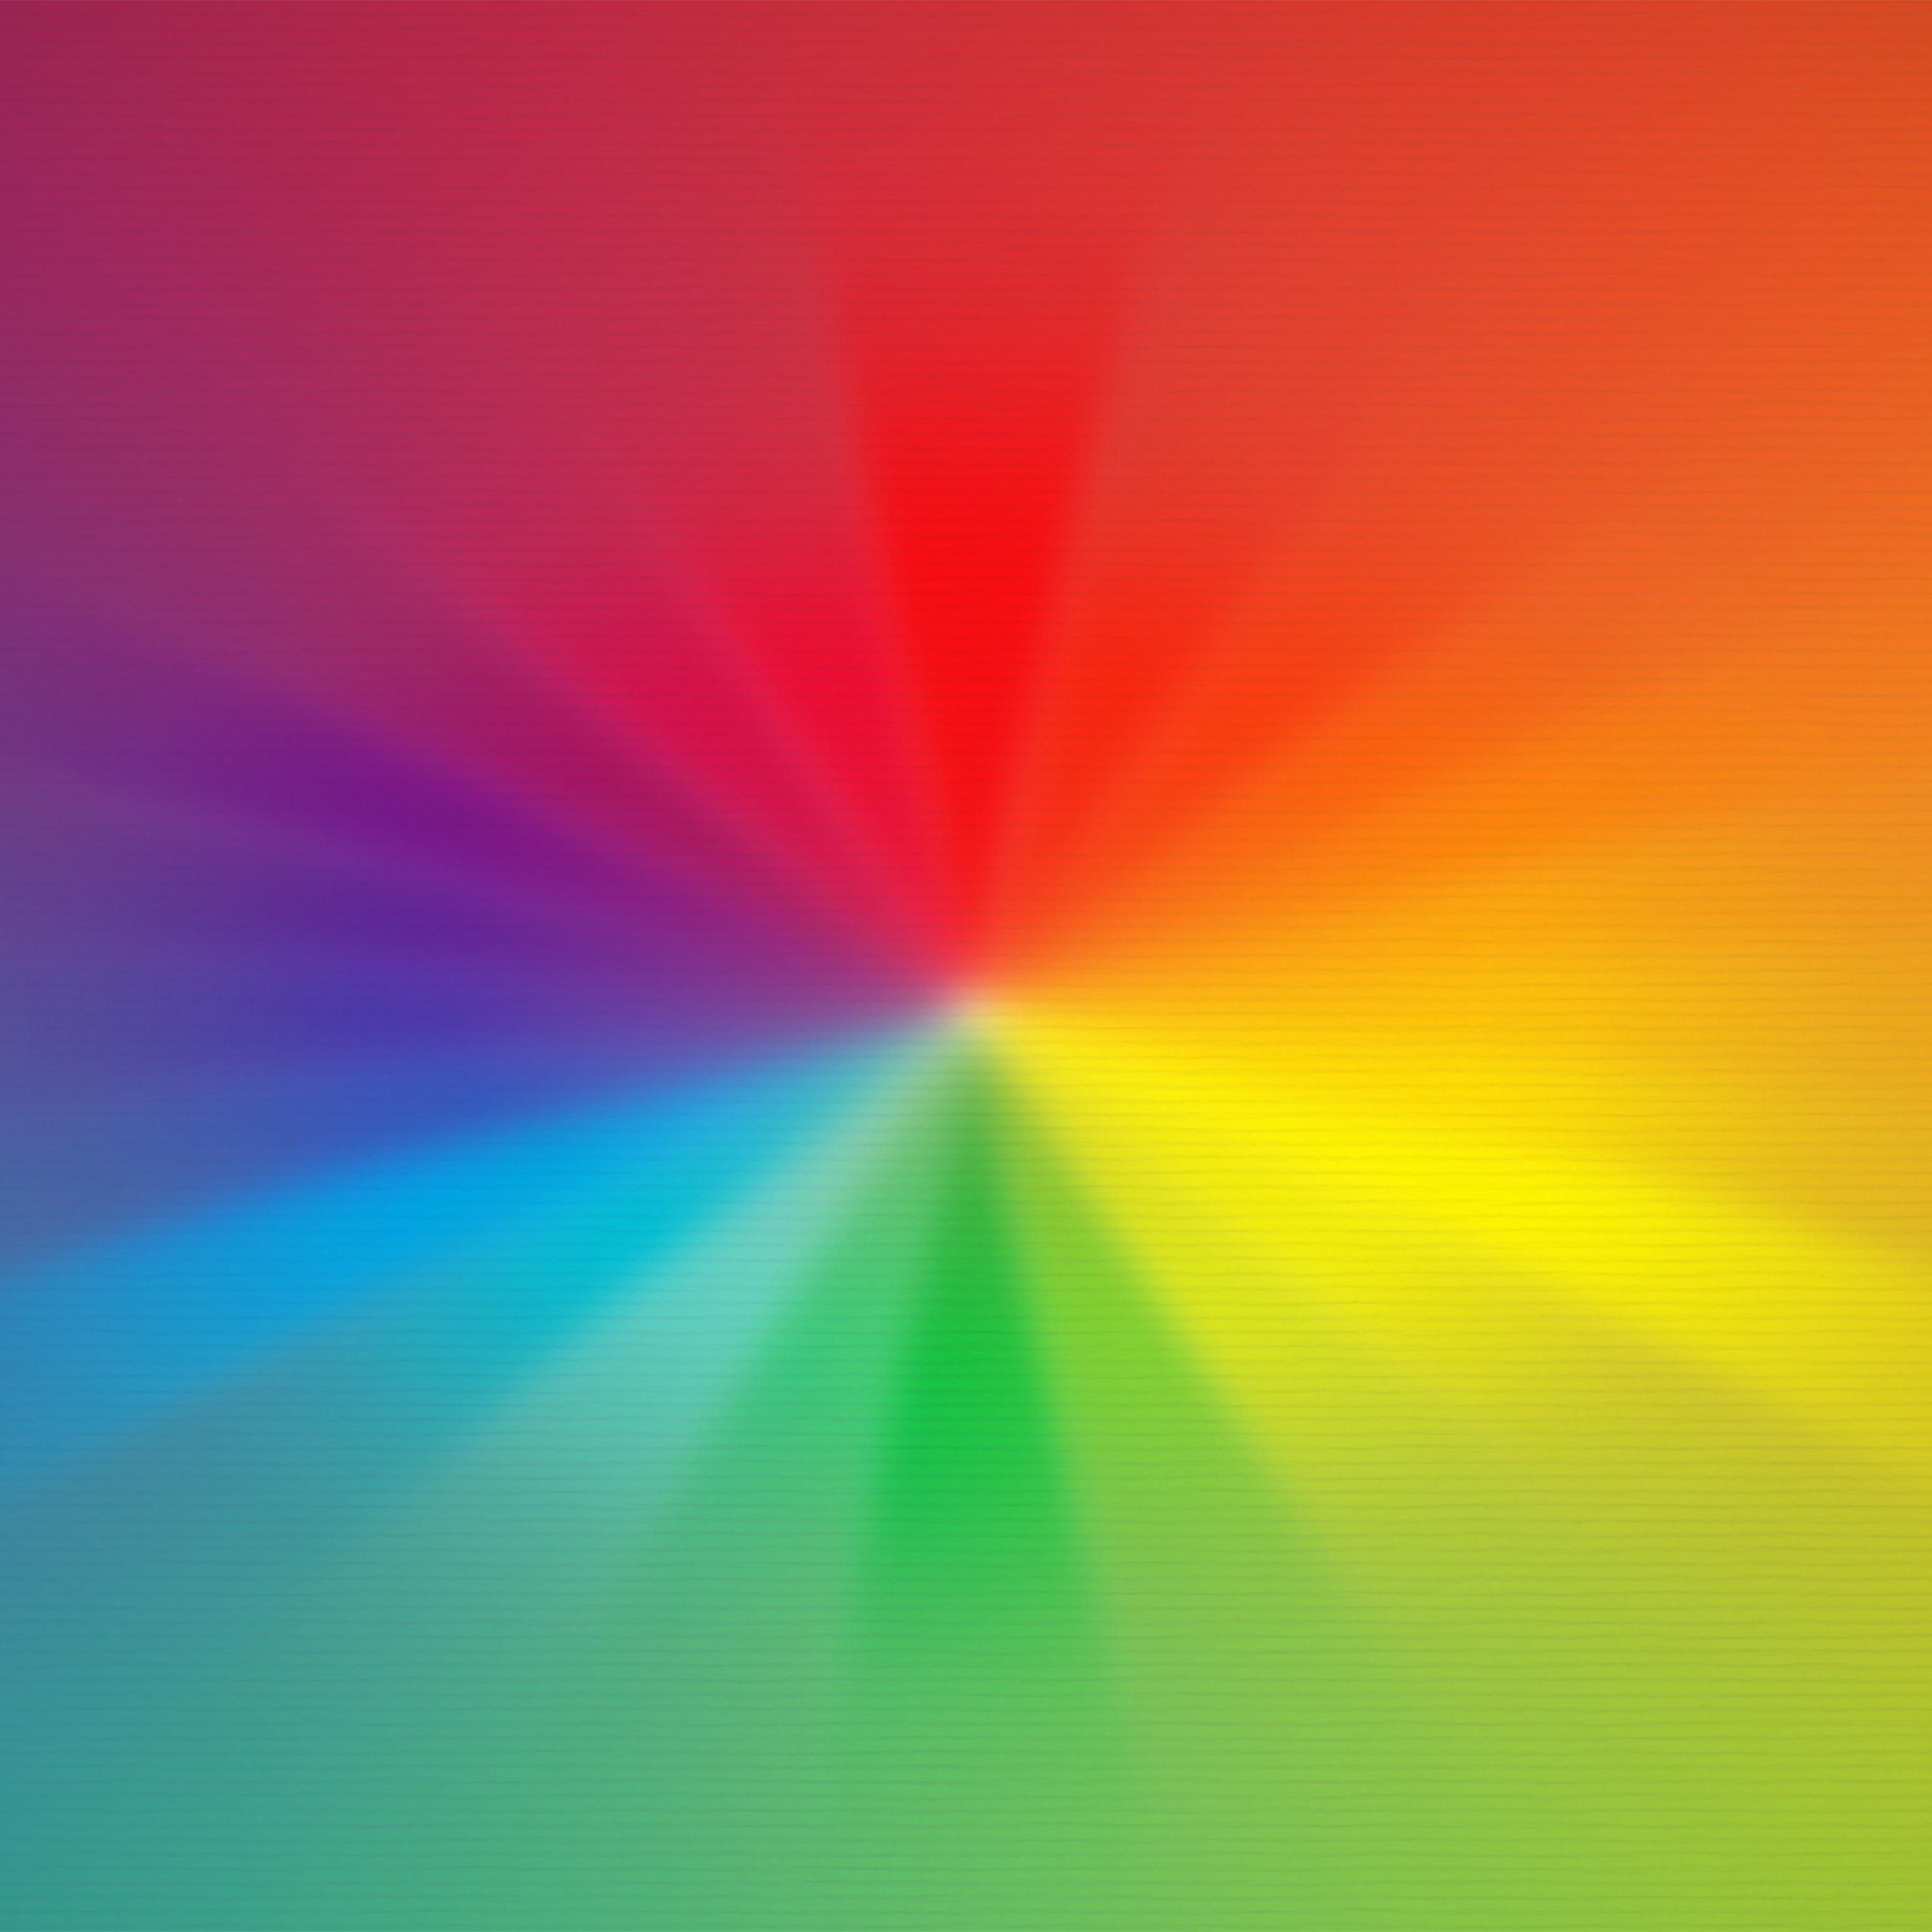 Vq44-rainbow-color-circle-pattern-wallpaper